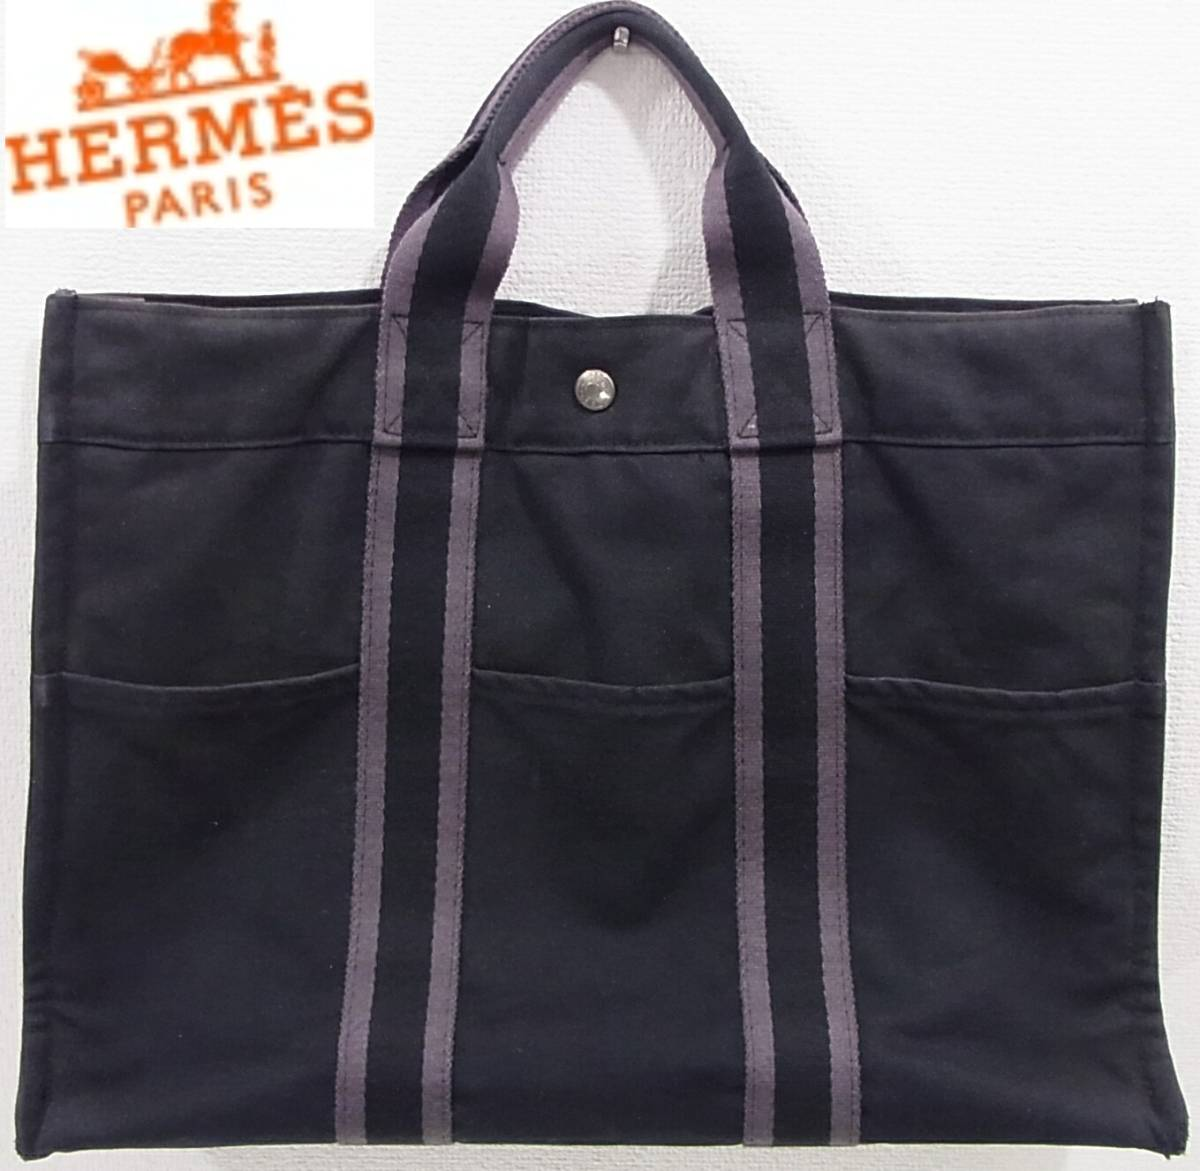 HERMES フールトゥMM 黒 キャンバストートバッグ ブラック×ダークグレー 2本ライン トートMM コットン手提げかばん ハンドバッグ エルメス_画像1